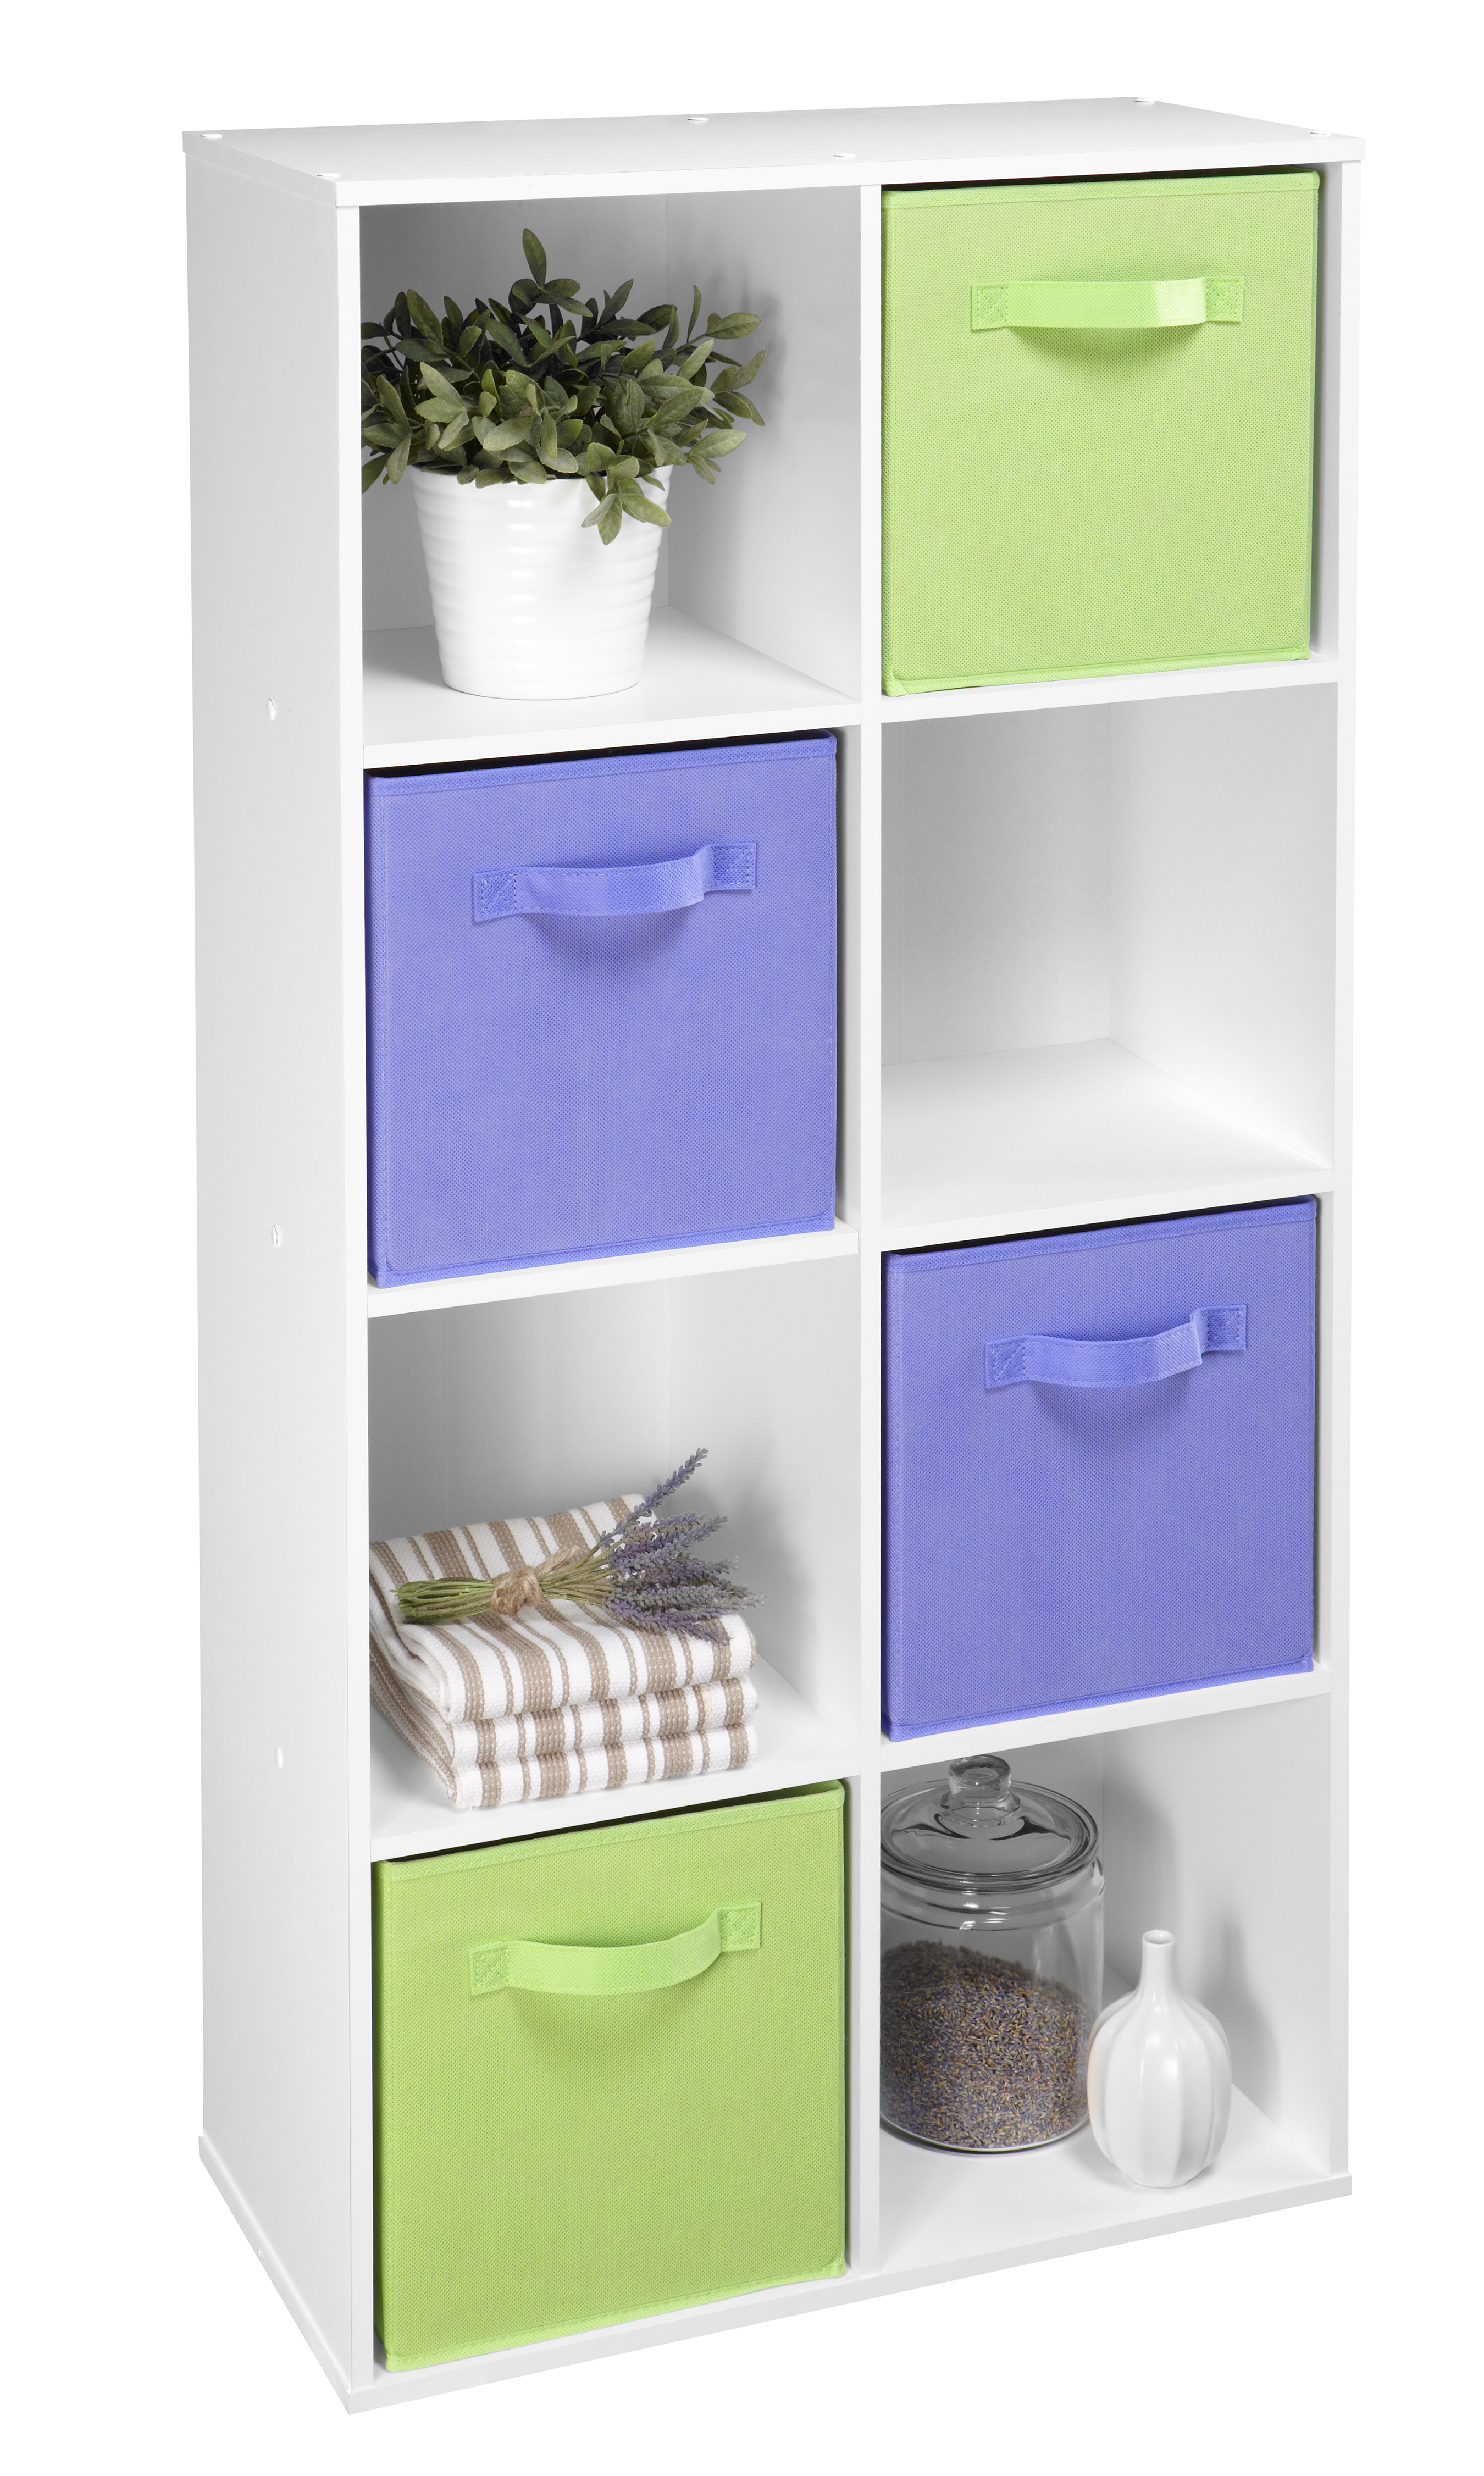 White 8 cube organizer